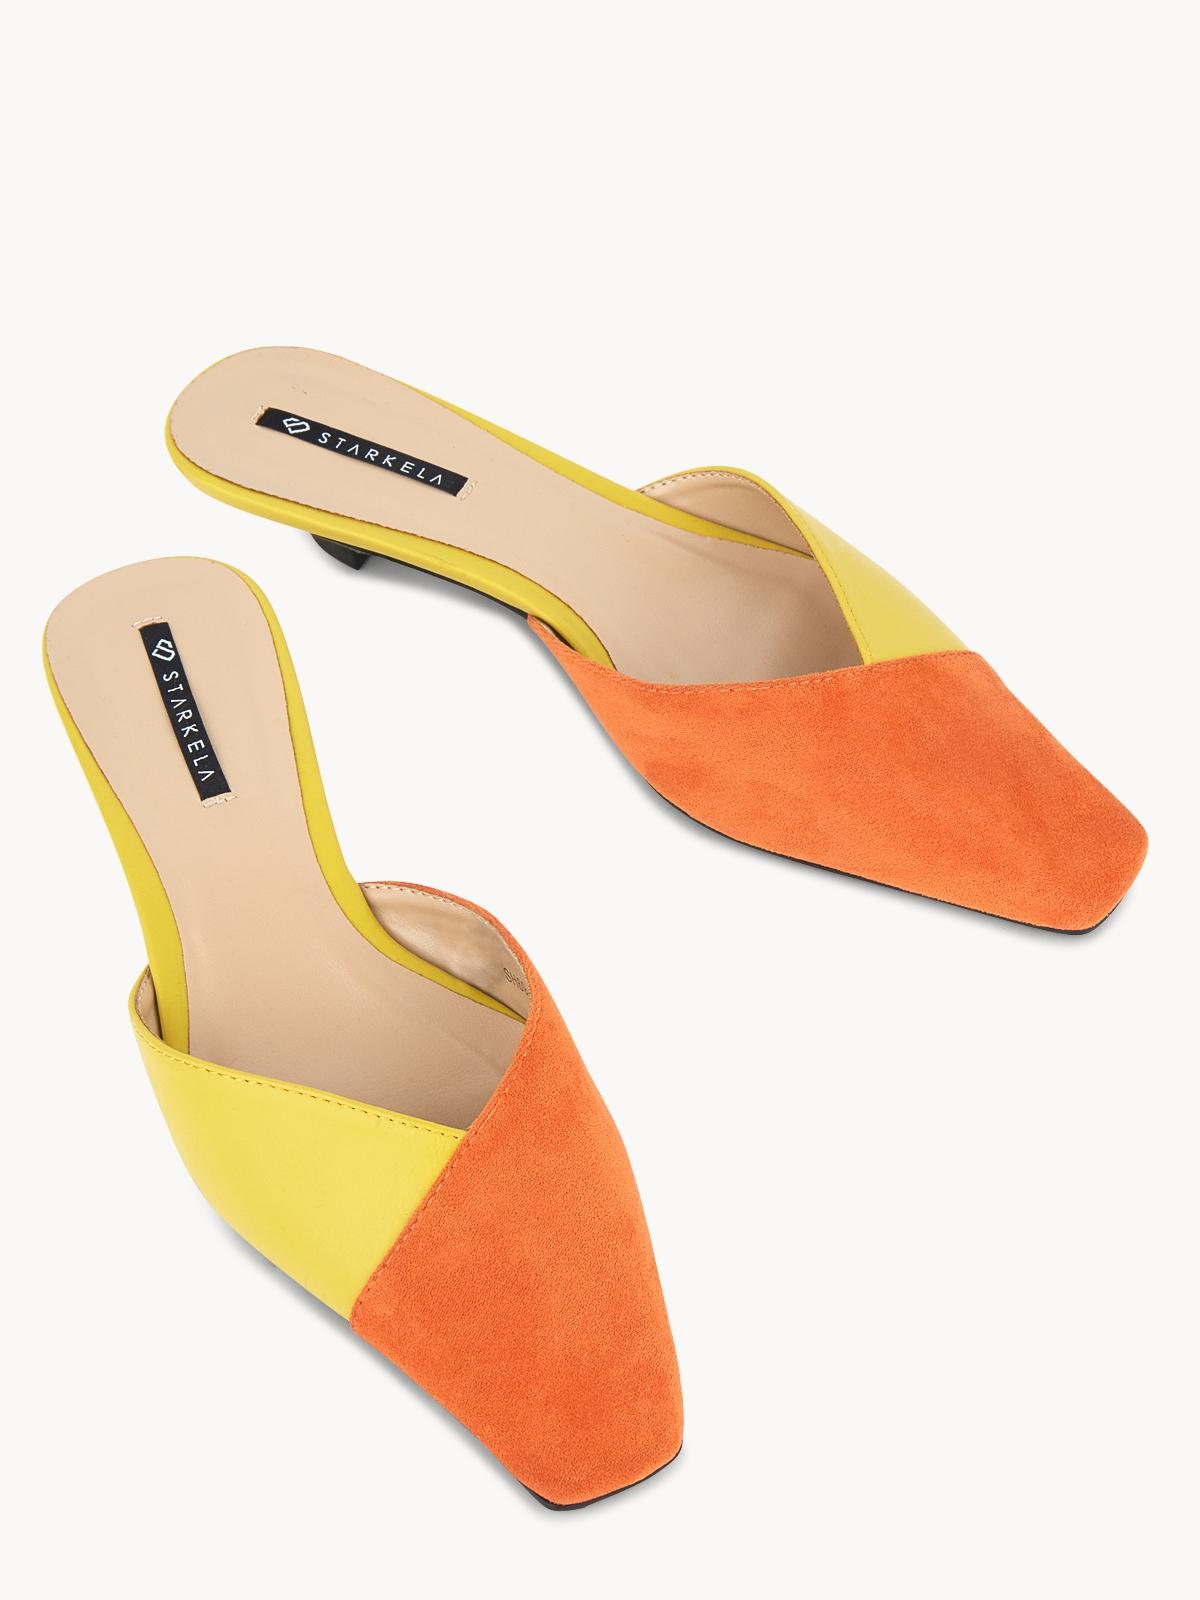 Starkela Two Tone Mid Heel Mules Orange